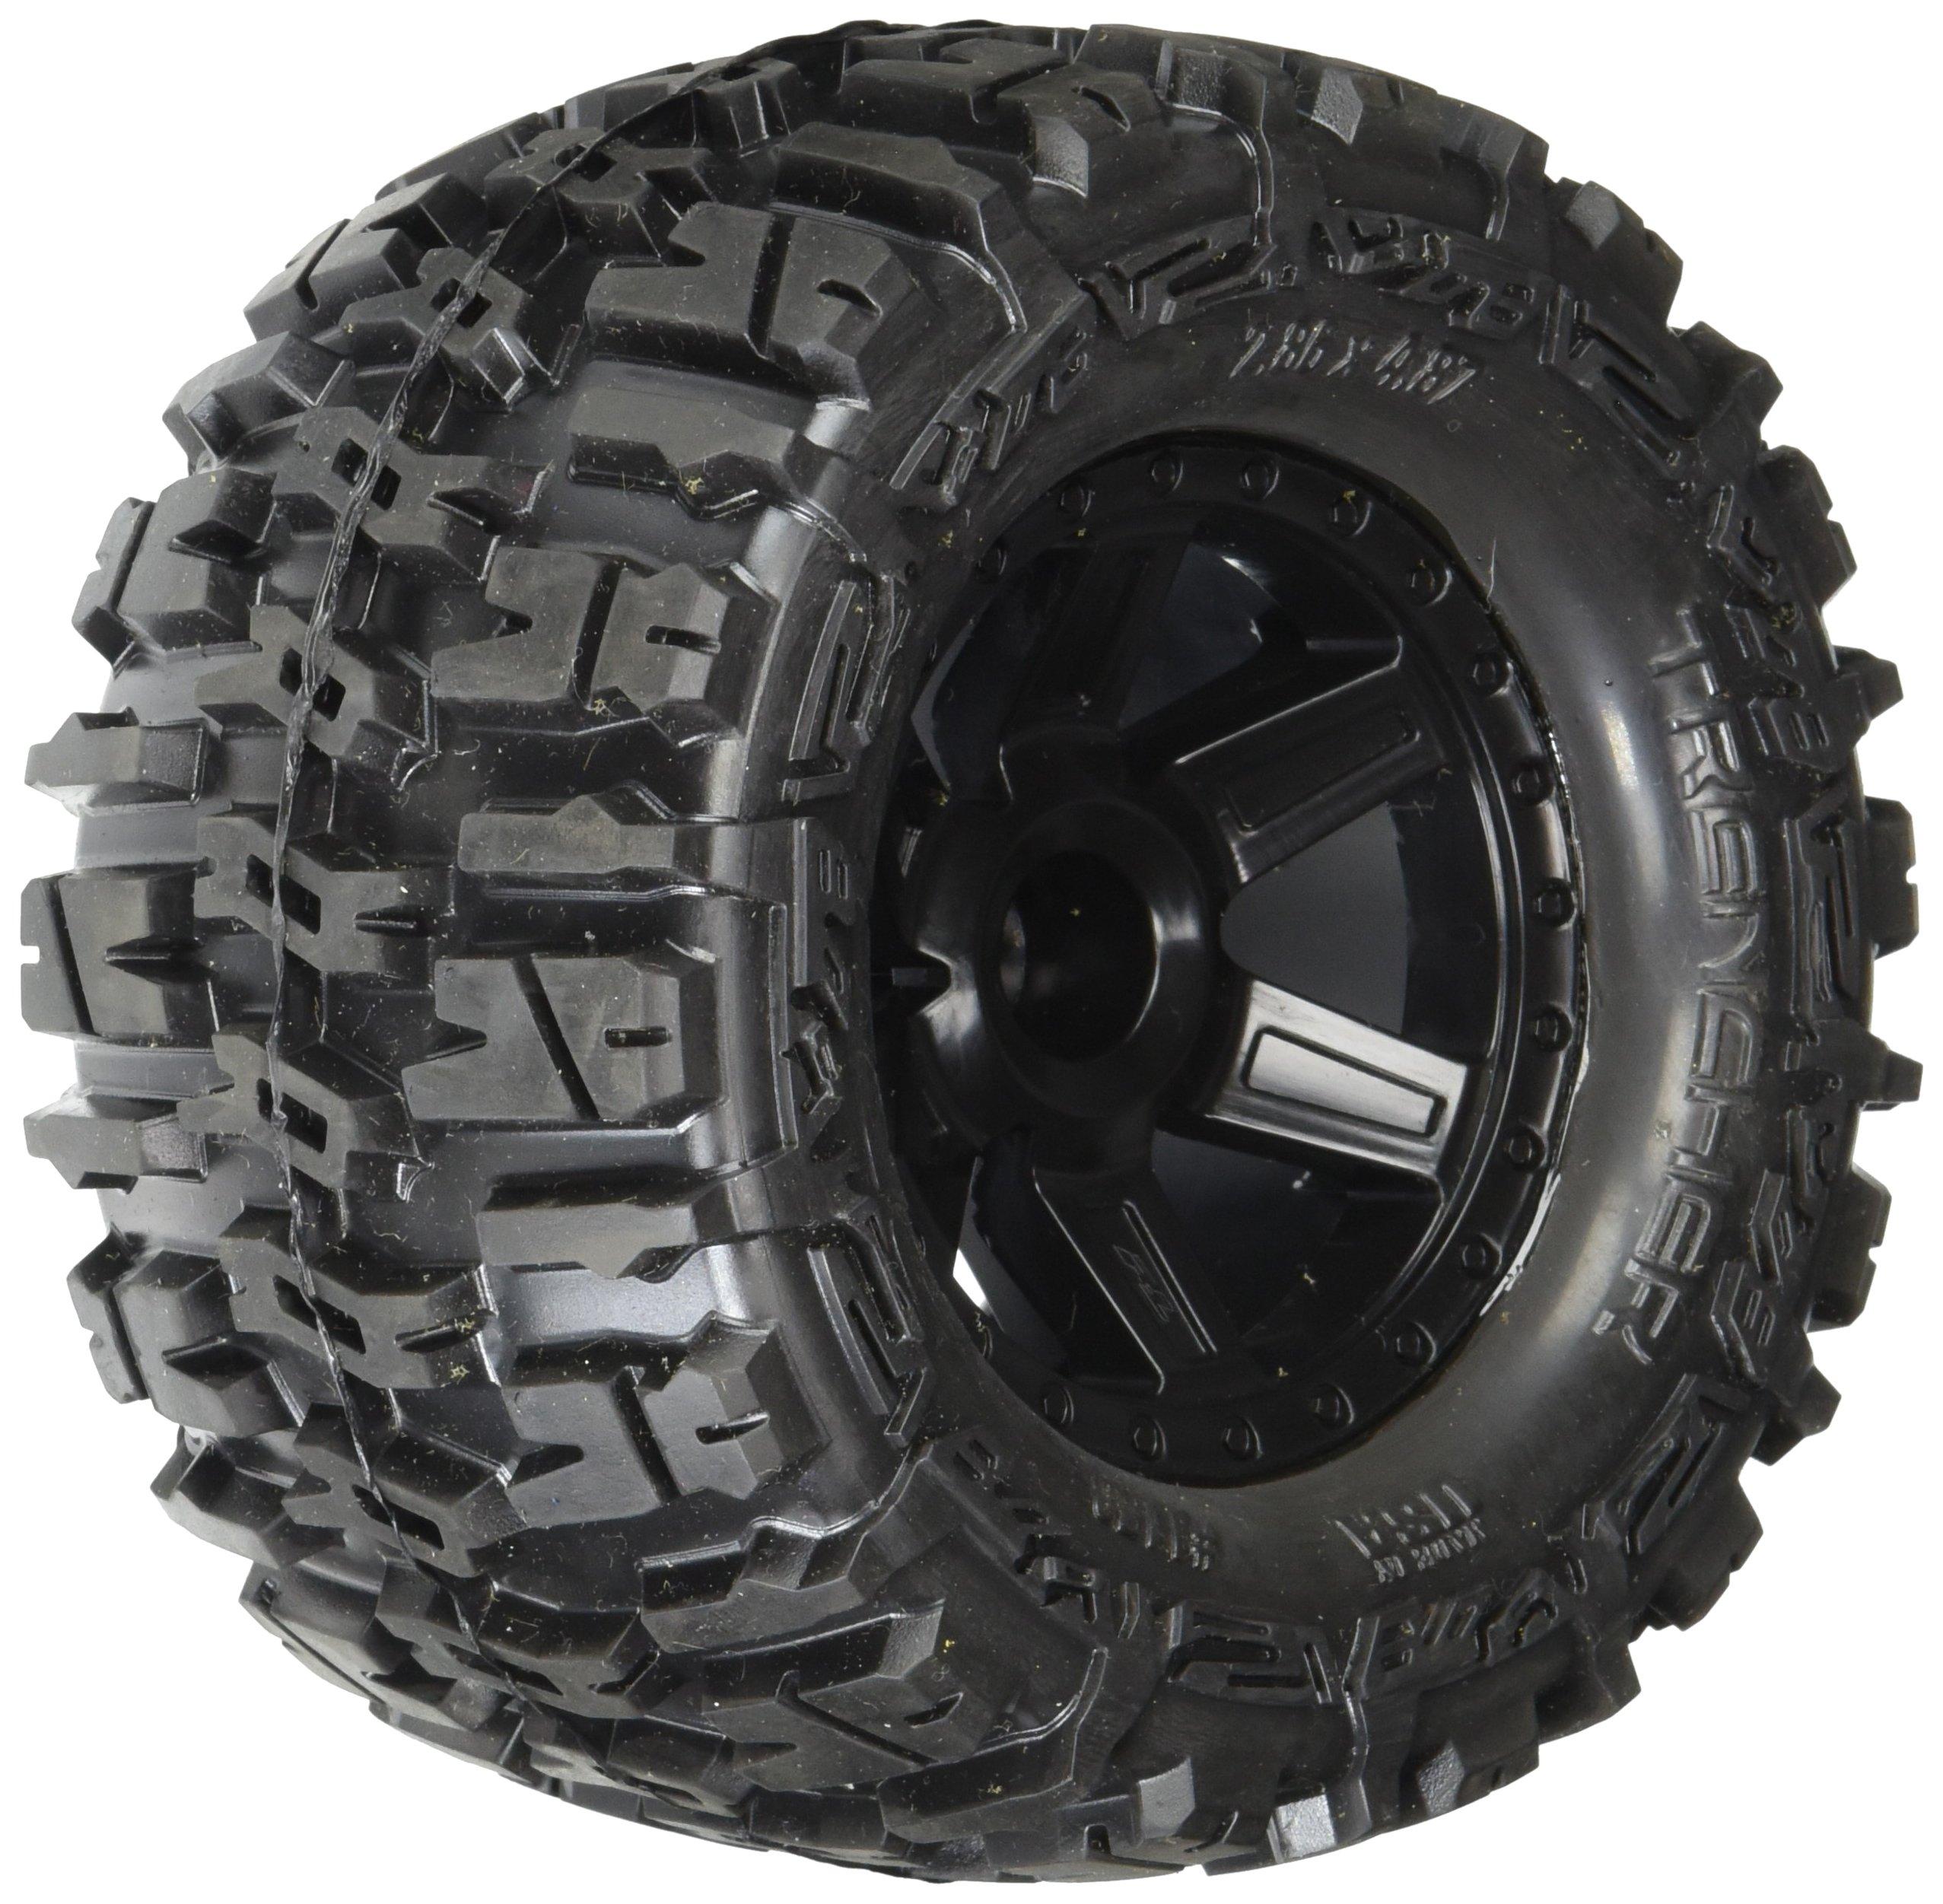 Proline 117012 Trencher 2.8'' All Terrain Tires Mounted for Jato, Nitro, Stampede